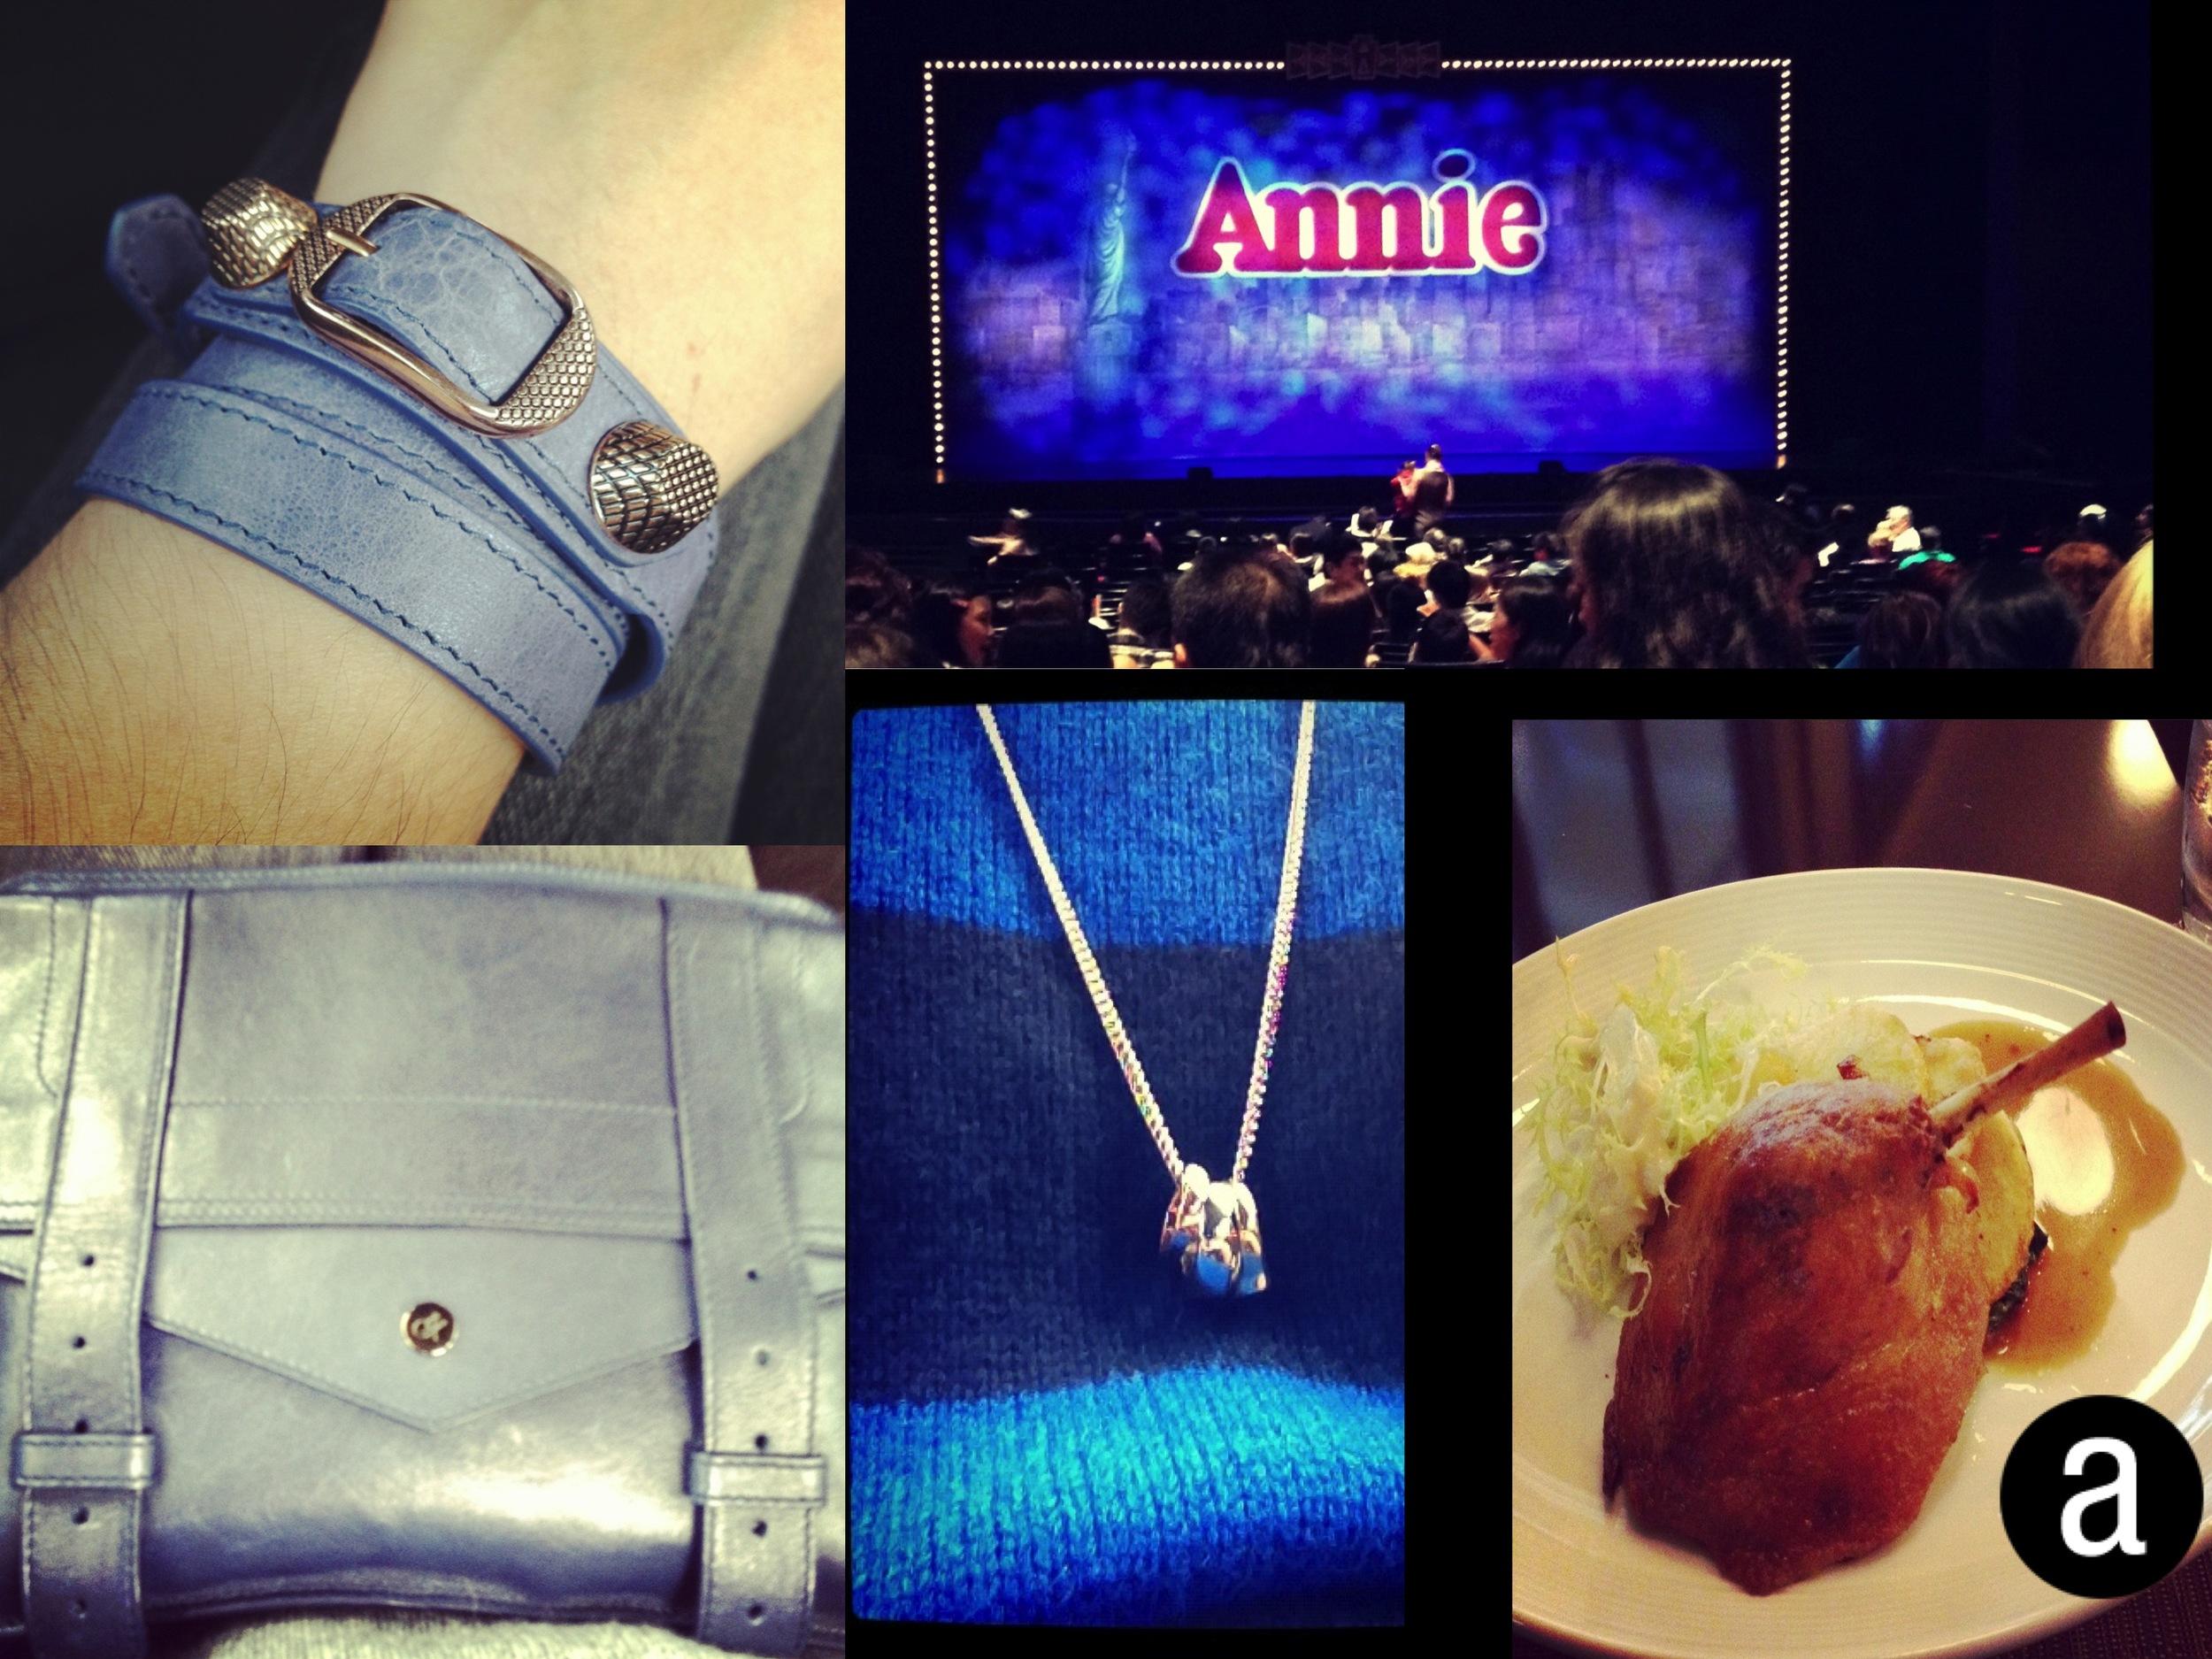 aMusing Photo Collage # 3 - Annie & Blue